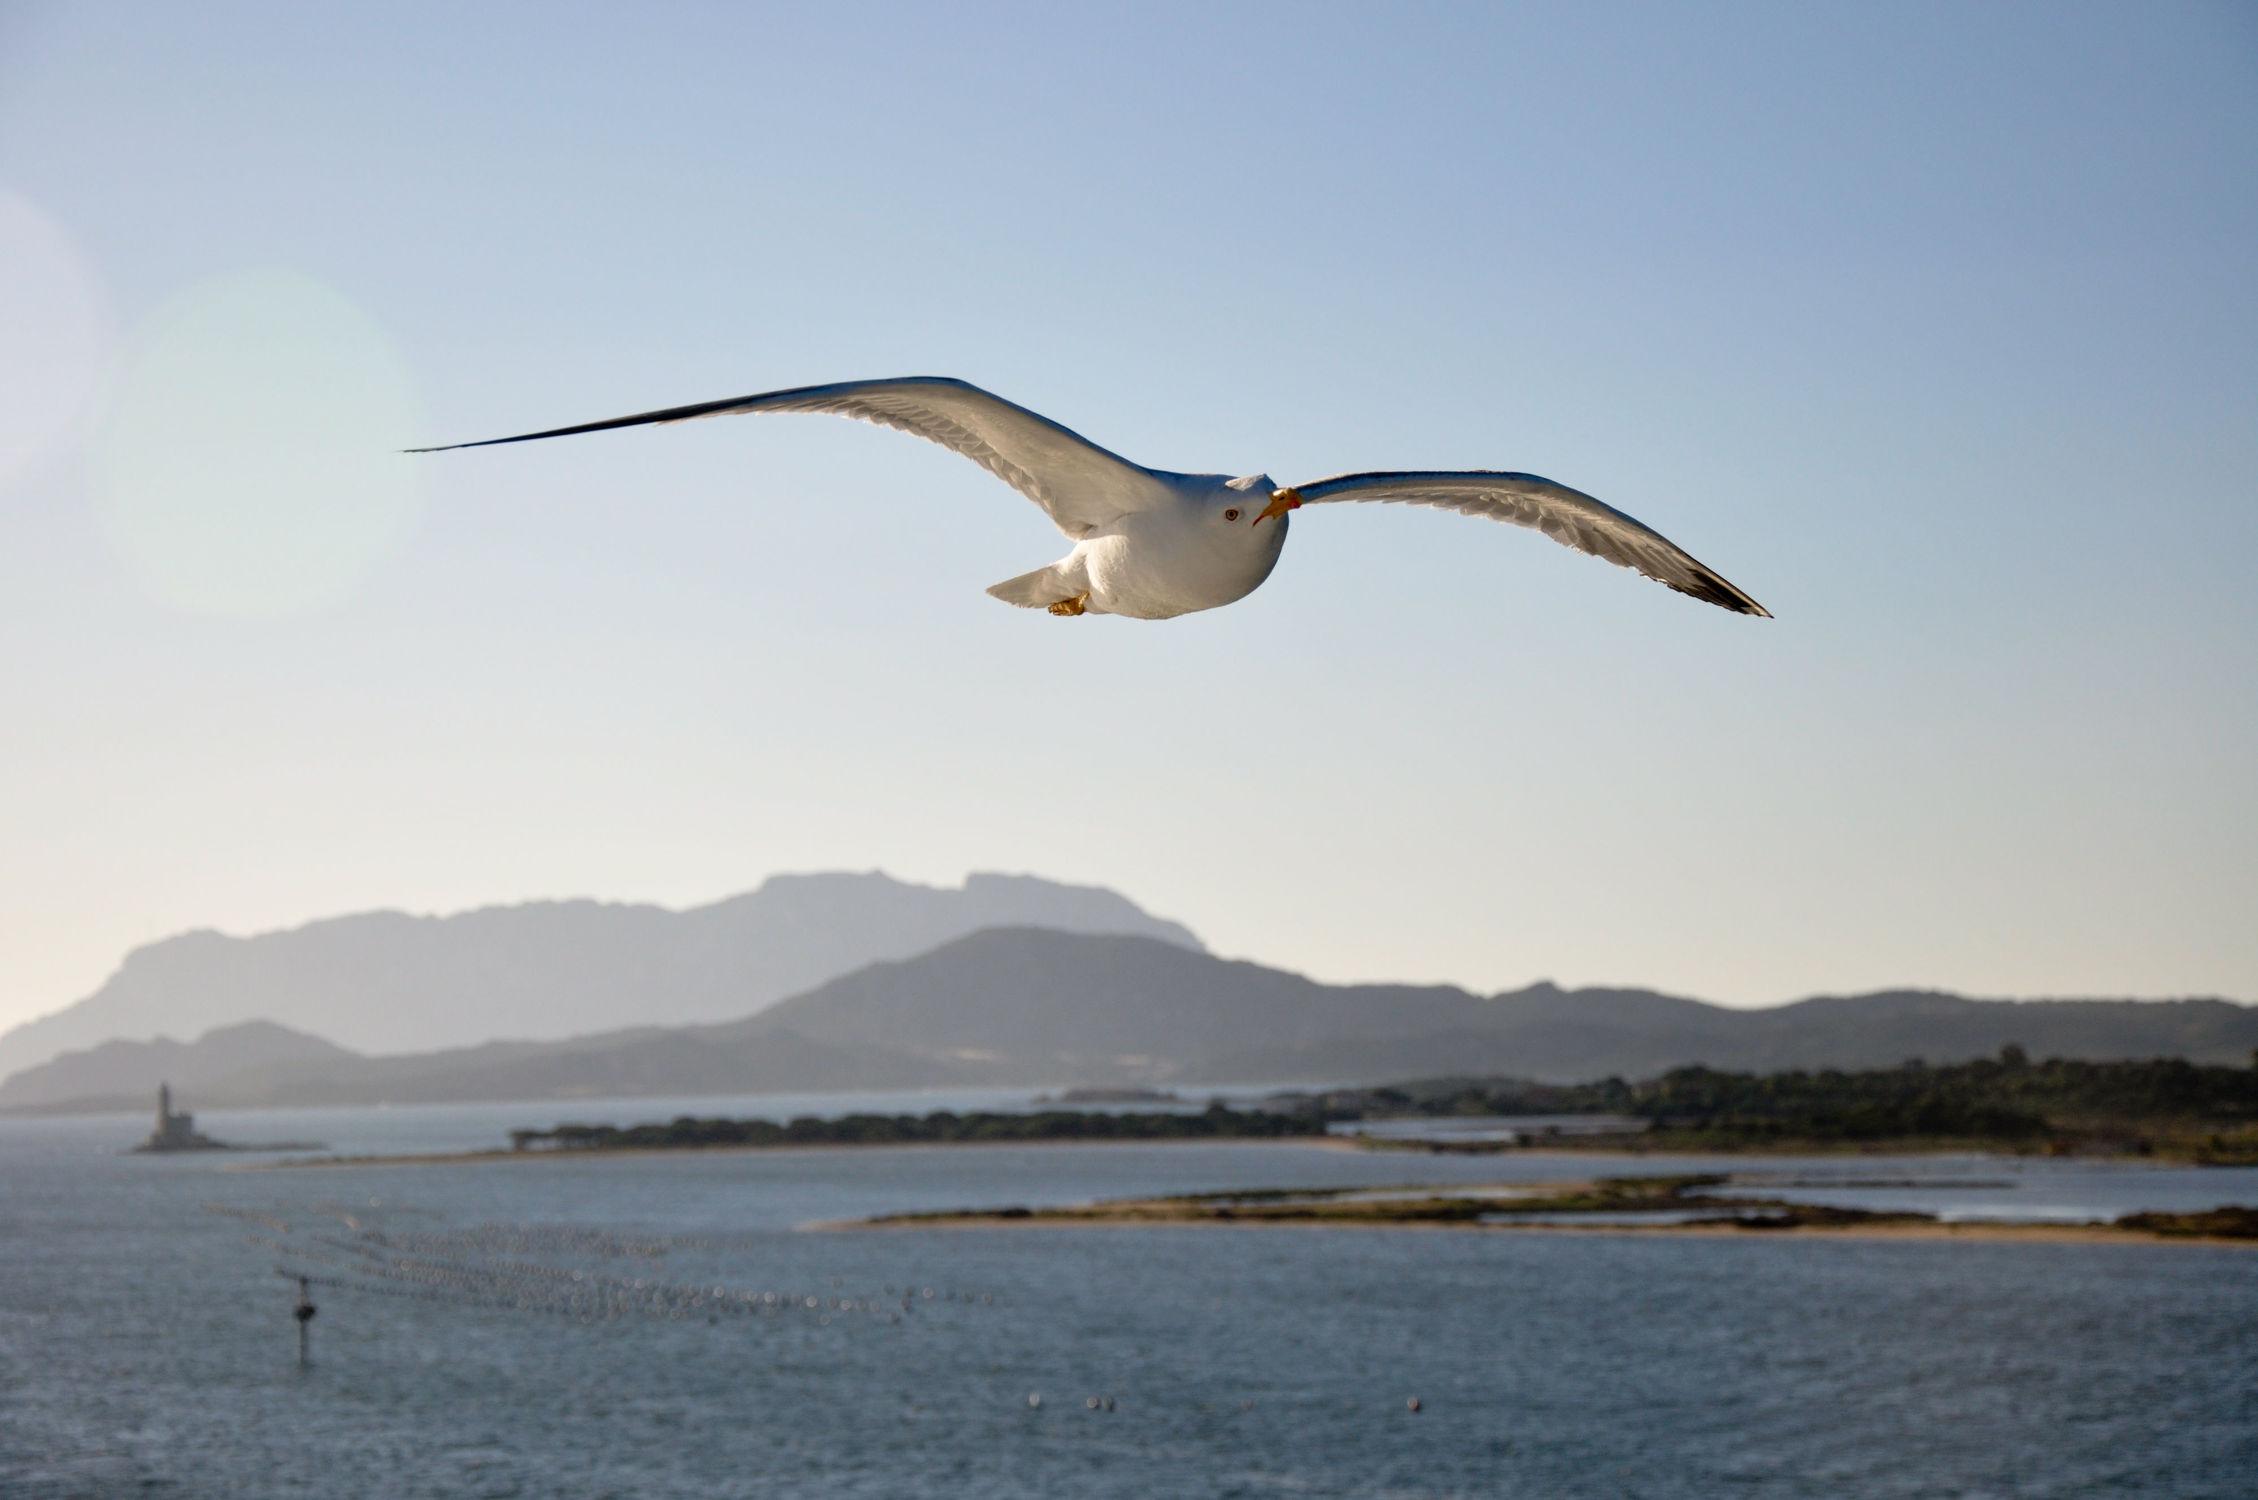 Bild mit Urlaub, Vögel, Vögel, Häfen, Möwen, Ostsee, Meer, Möwe, See, landscape, Möve, Ostseebilder, Möven